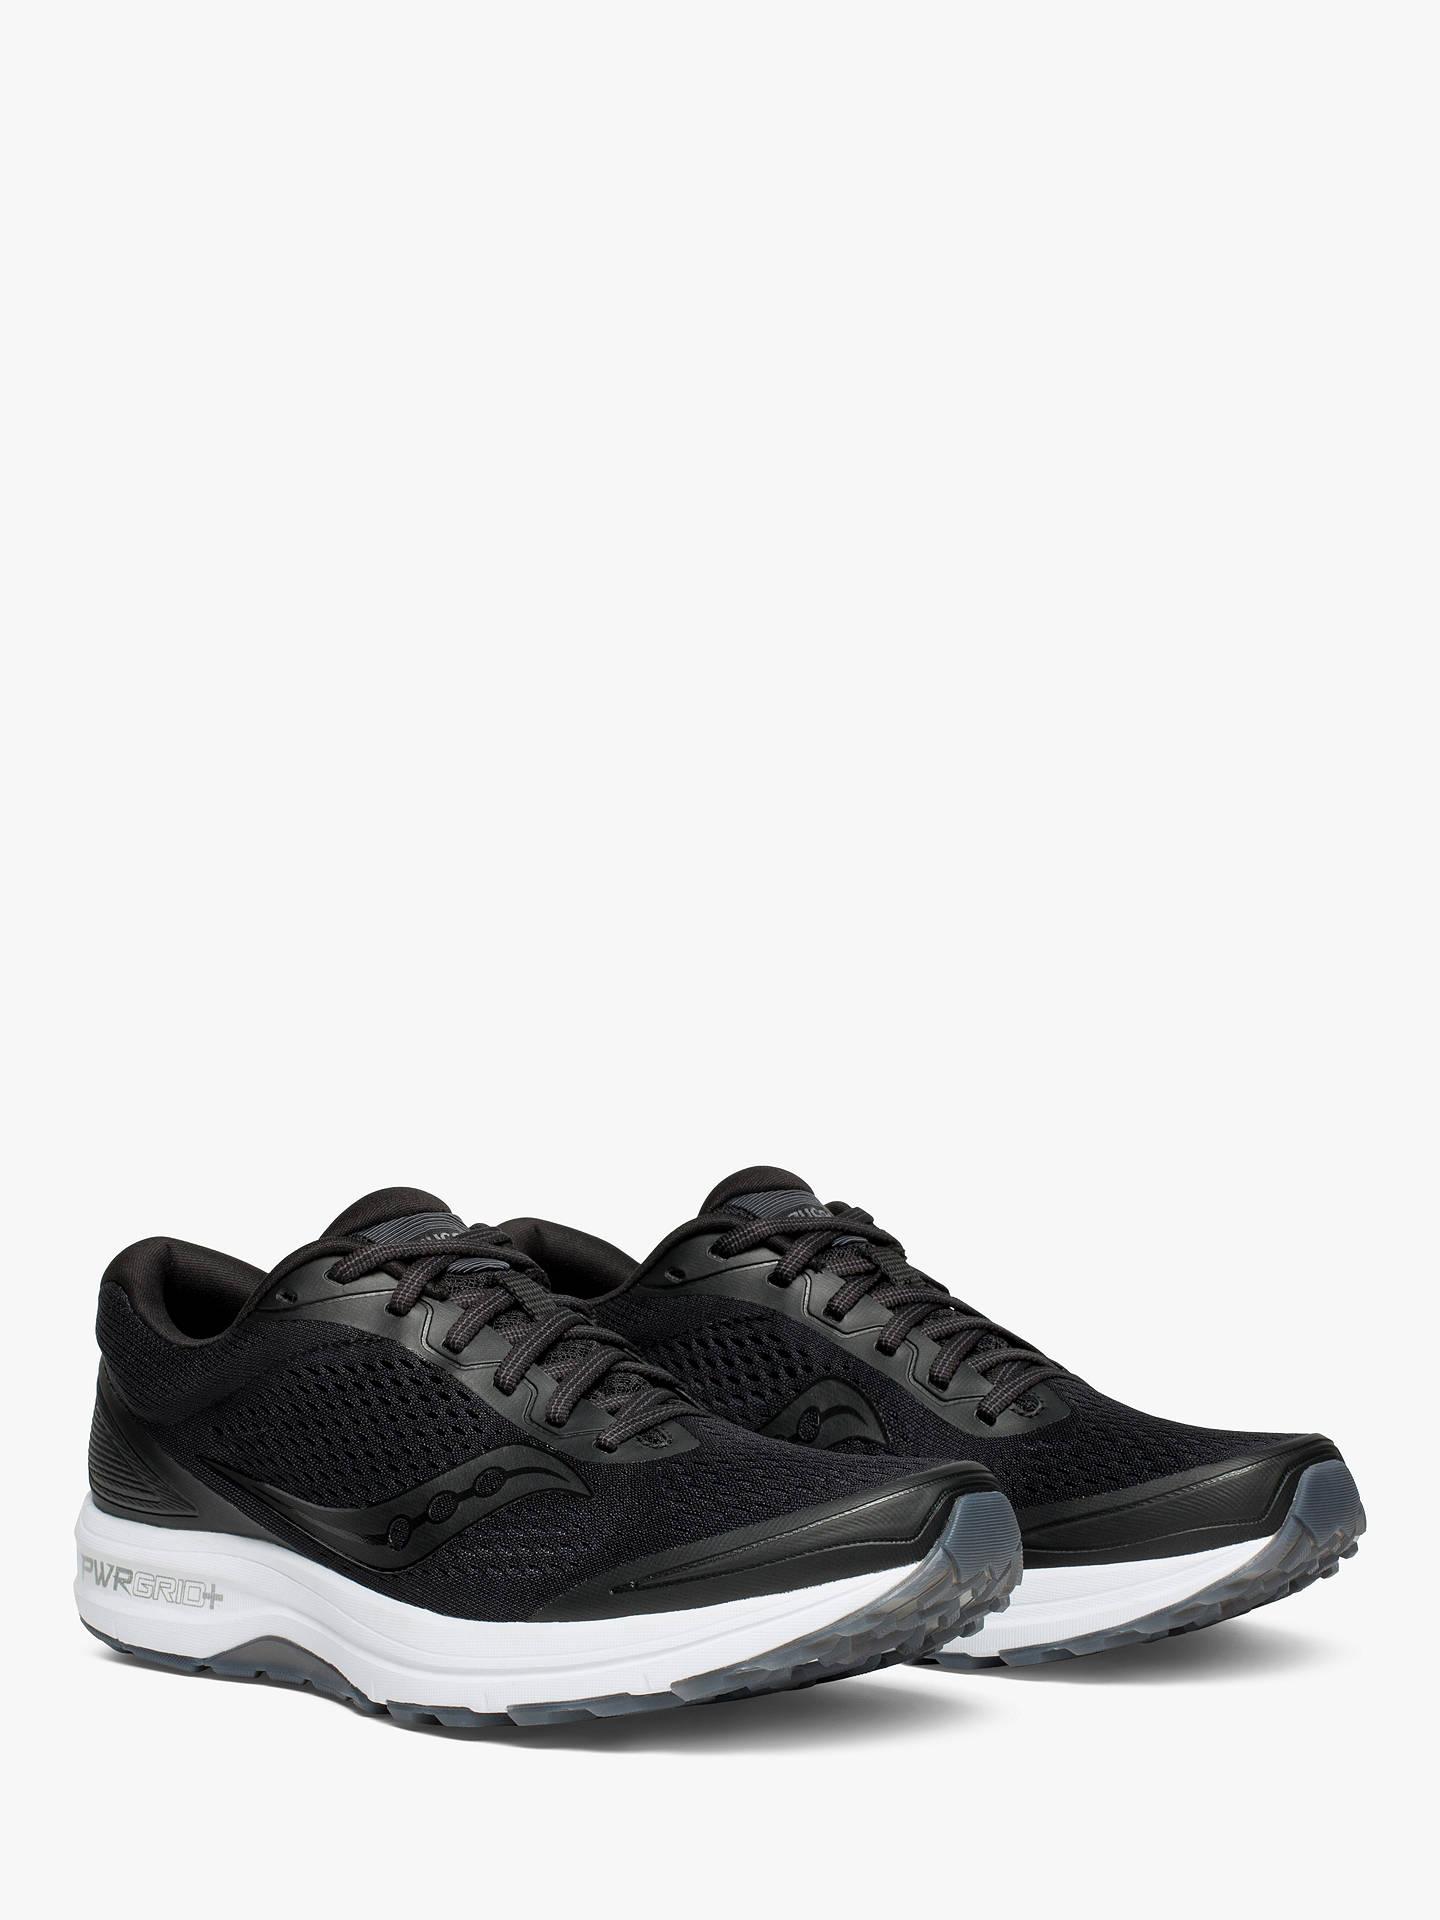 3fd1854081 Saucony Clarion Men's Running Shoes, Black